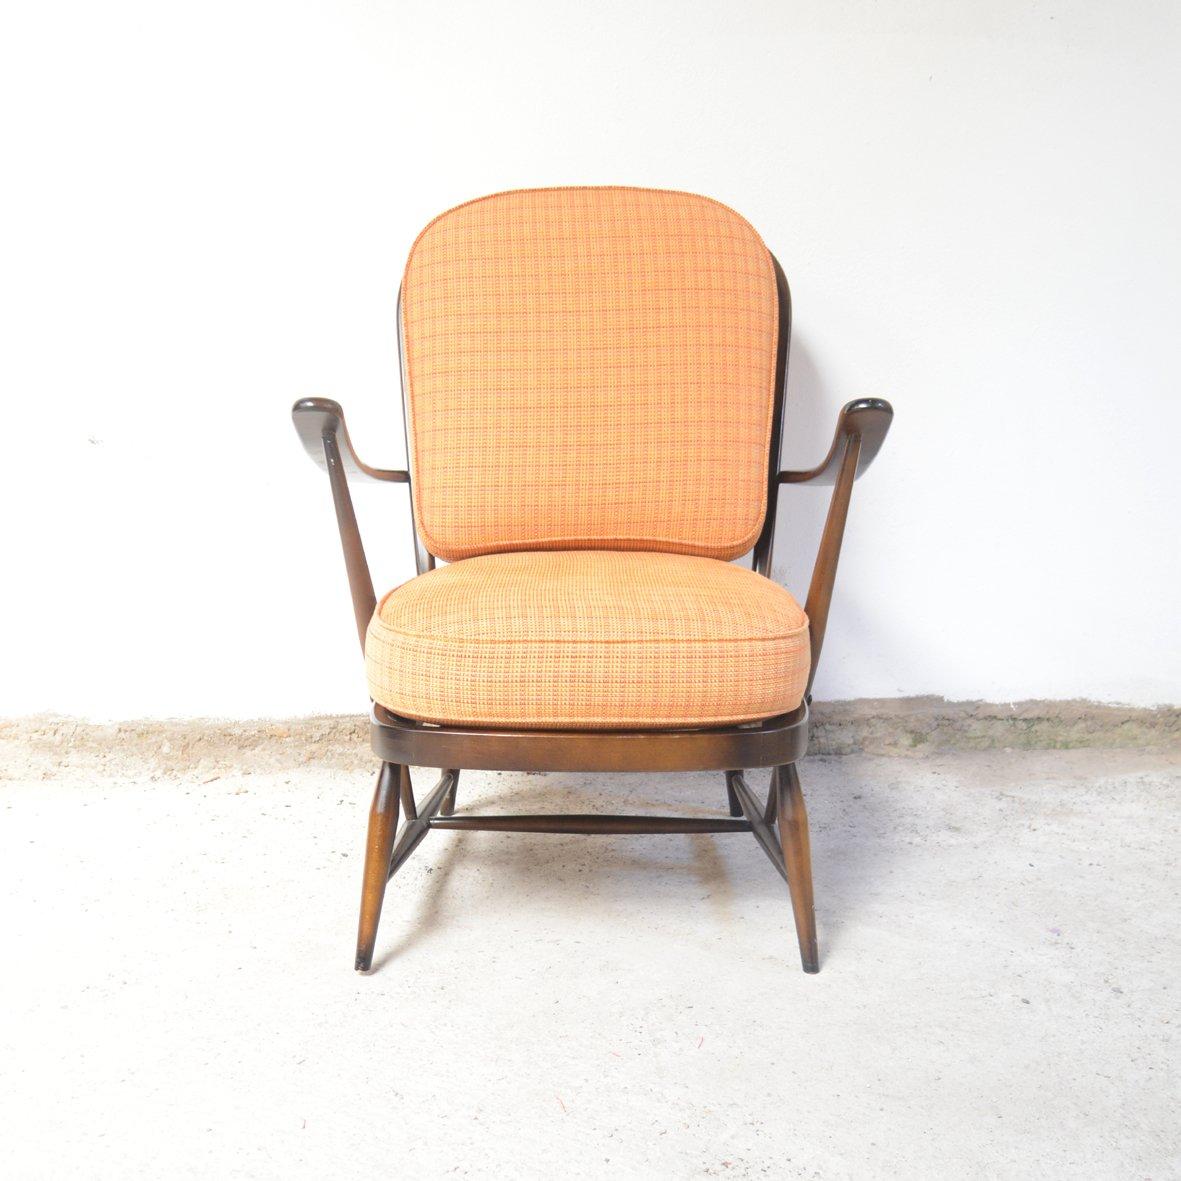 sessel von lucian ercolani f r ercol 1960er bei pamono kaufen. Black Bedroom Furniture Sets. Home Design Ideas